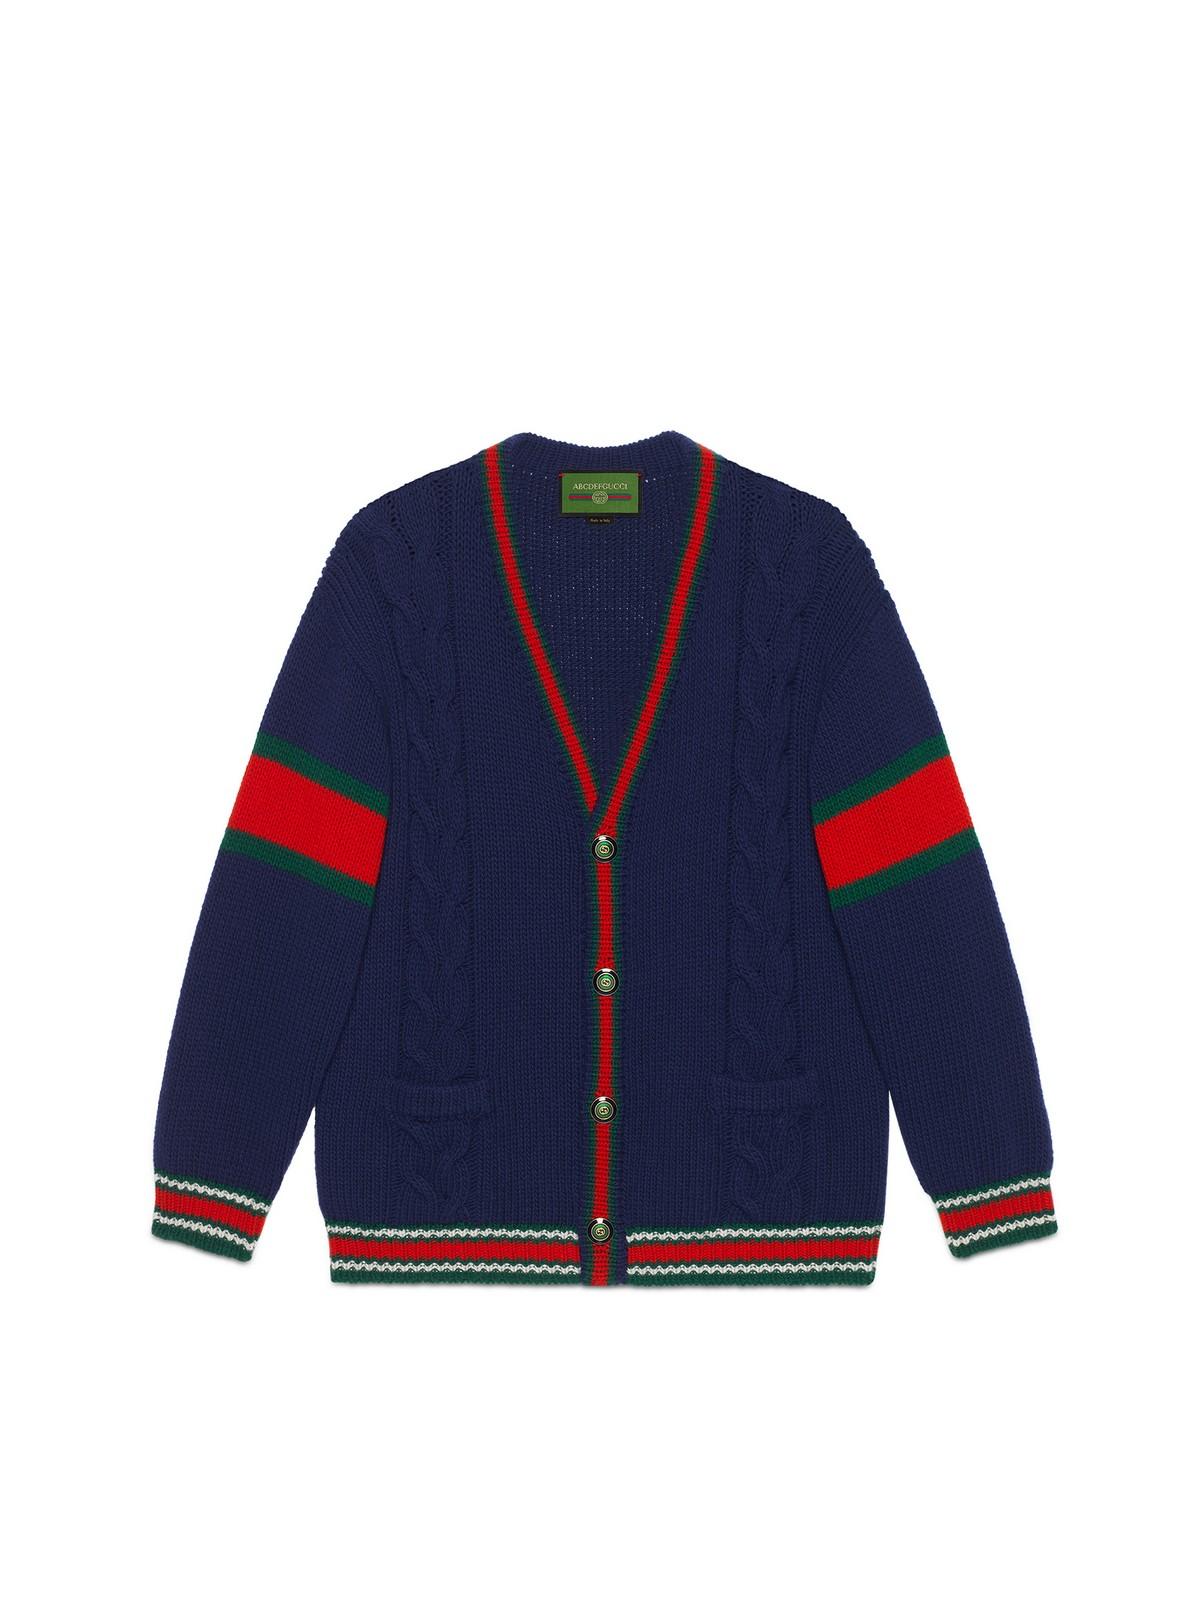 Gucci DIY maglieria 2018